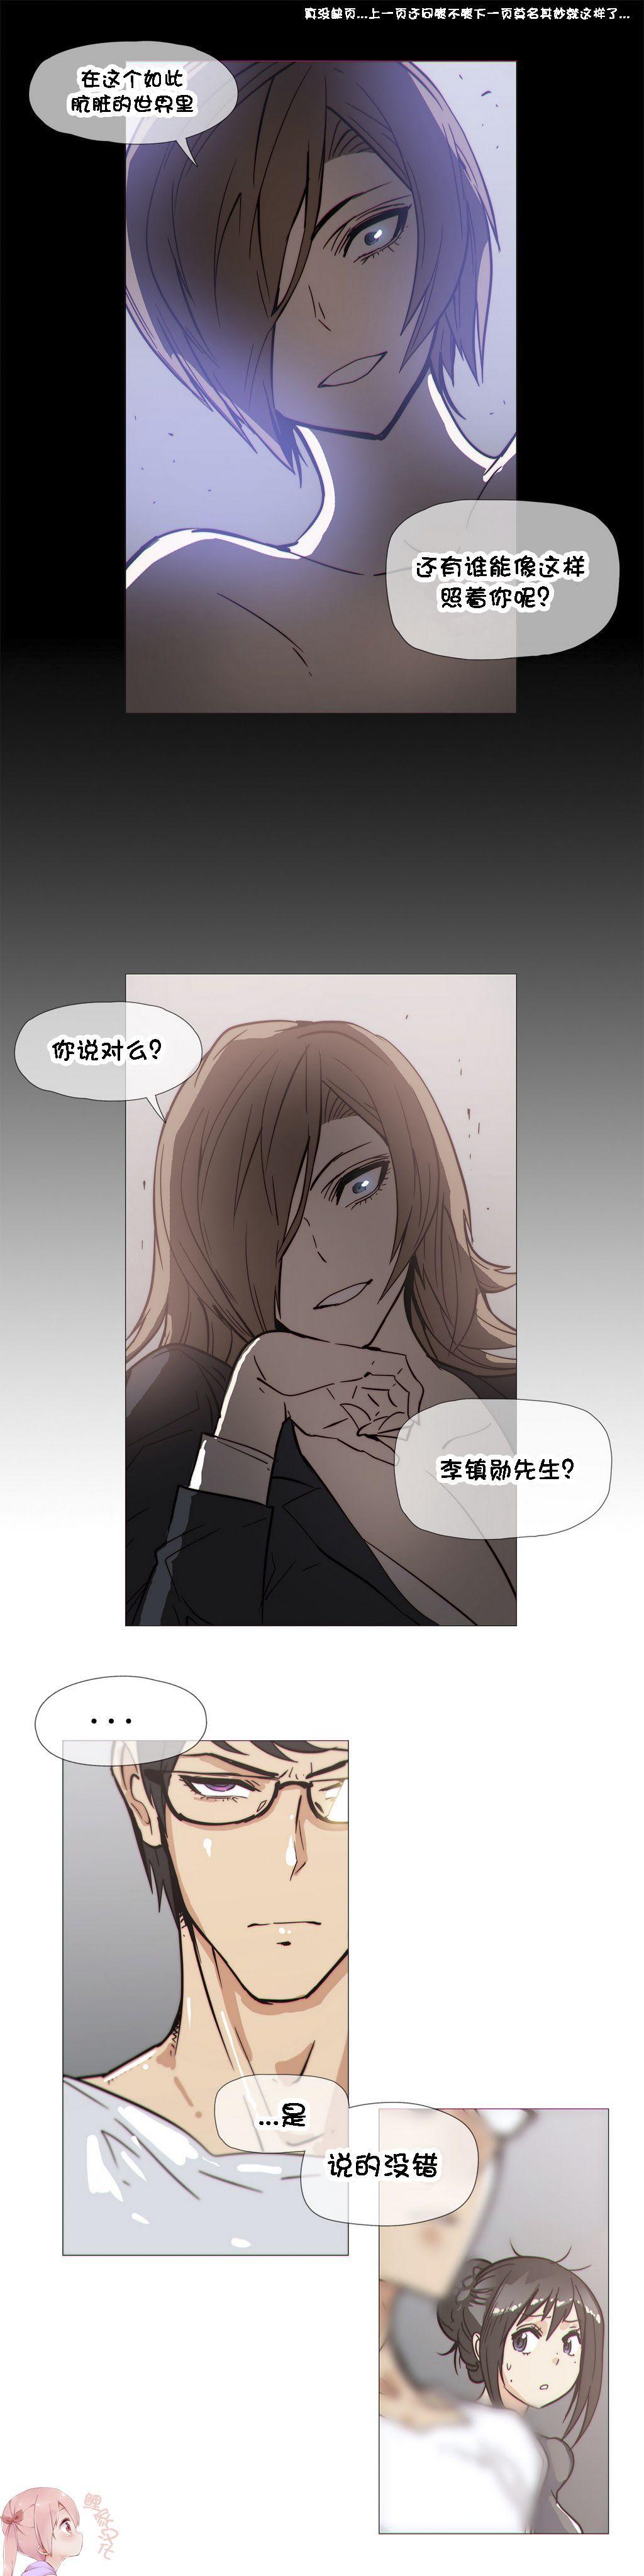 HouseHold Affairs 【卞赤鲤个人汉化】1~33话(持续更新中) 662